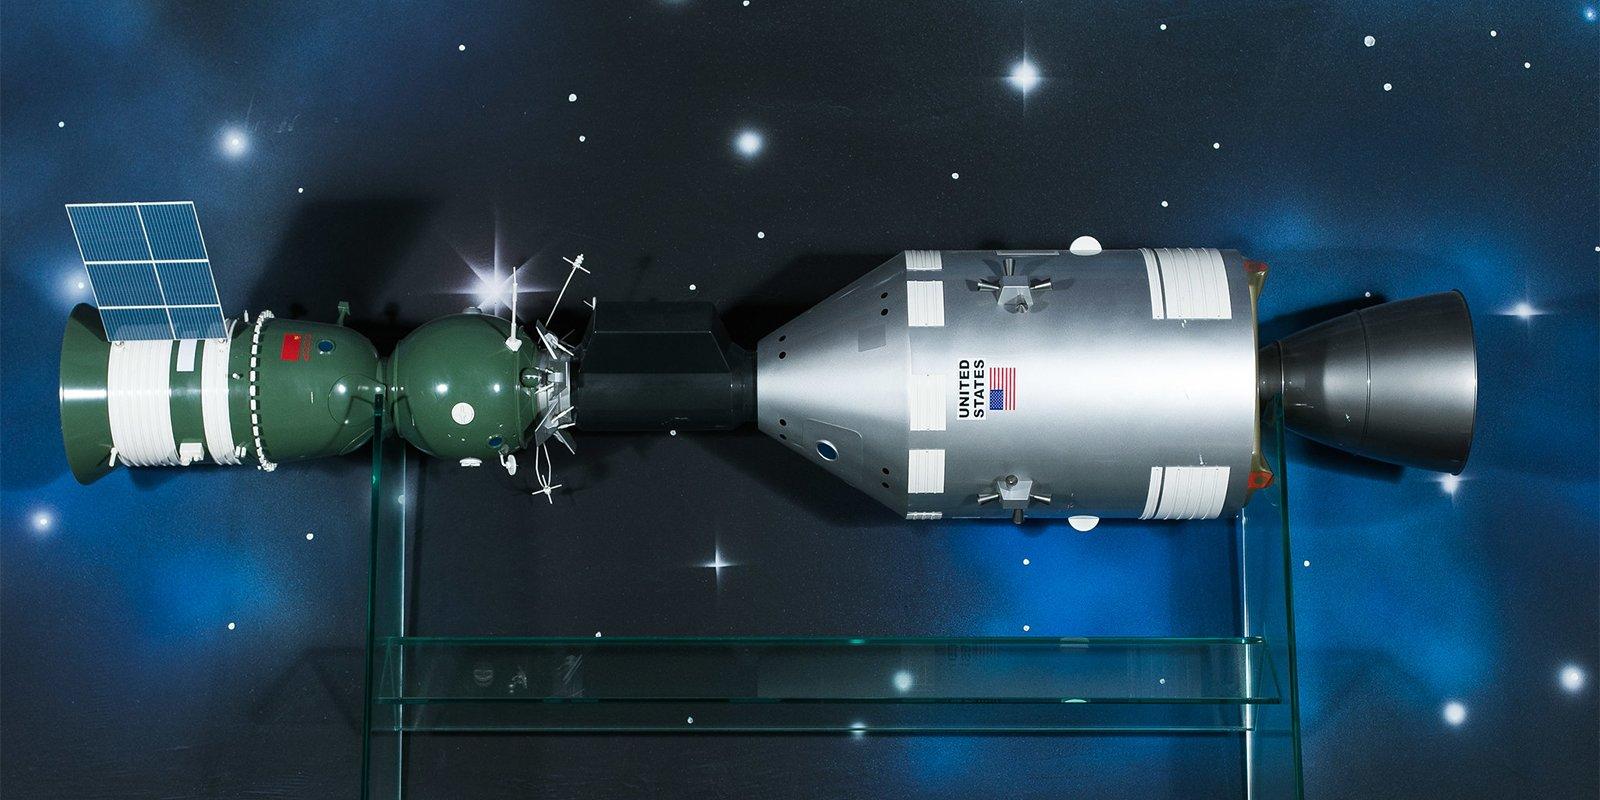 Фото: Музей космонавтики